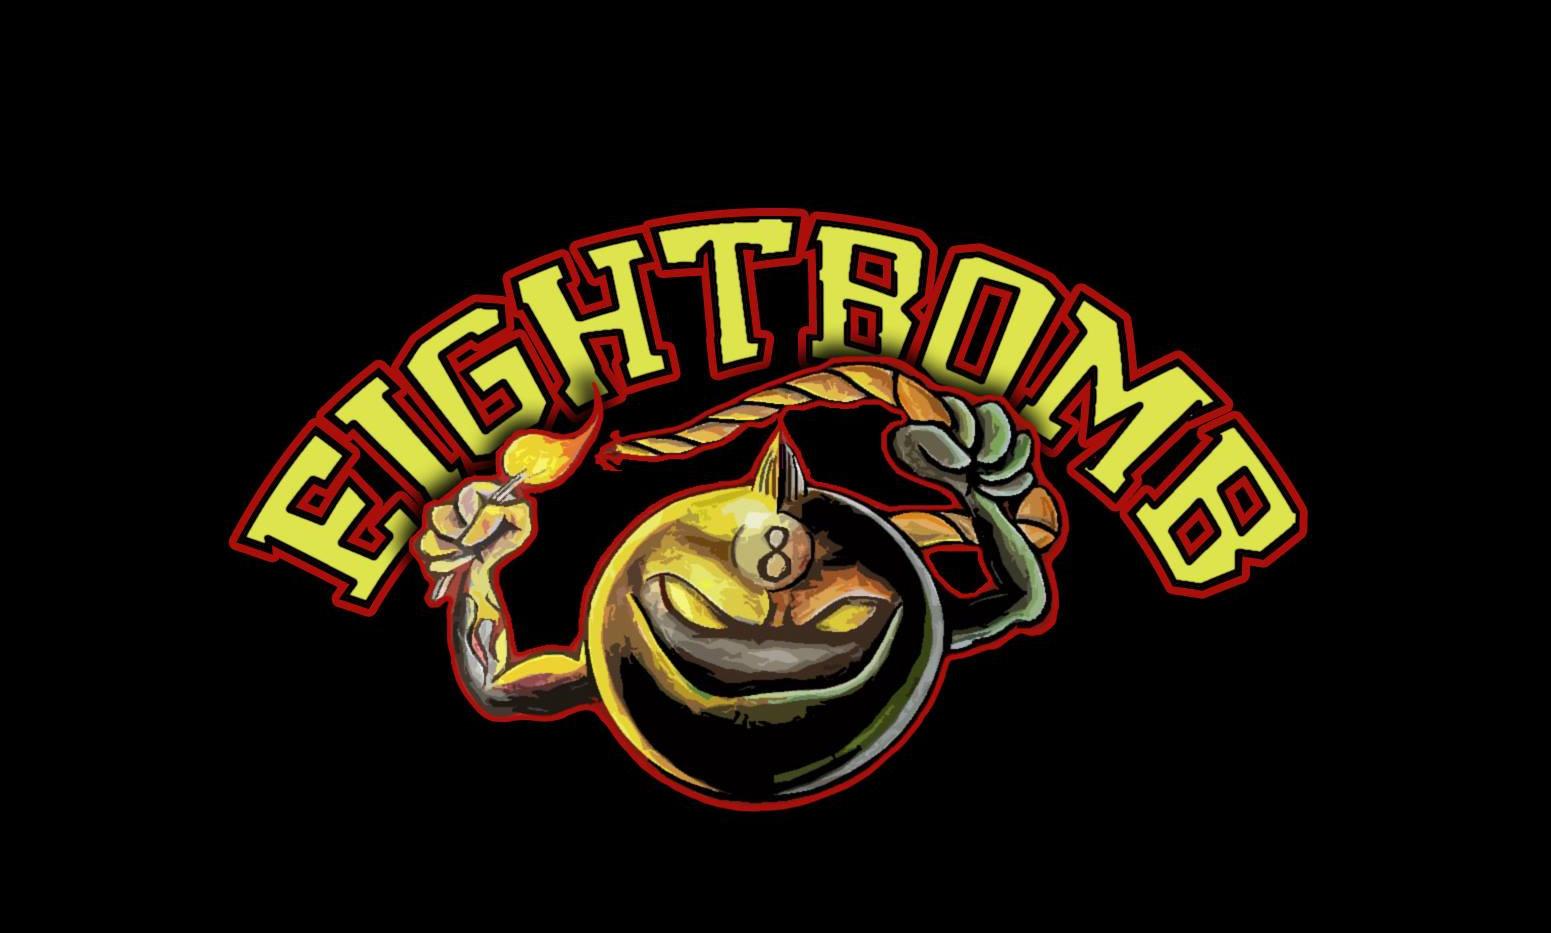 Eightbomb (1).jpg